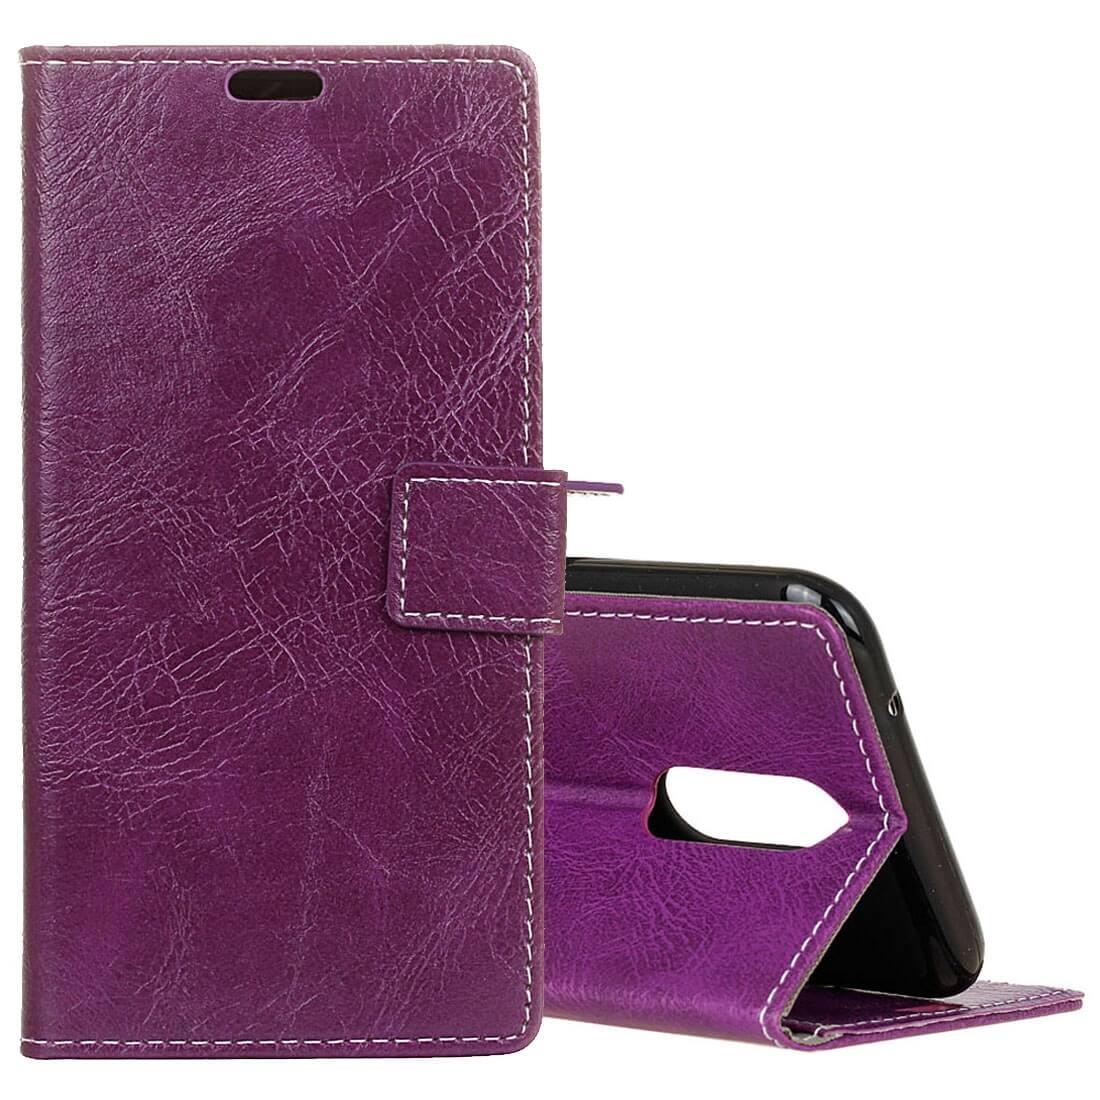 FORCELL RETRO Peňaženkový obal LG K11 fialový